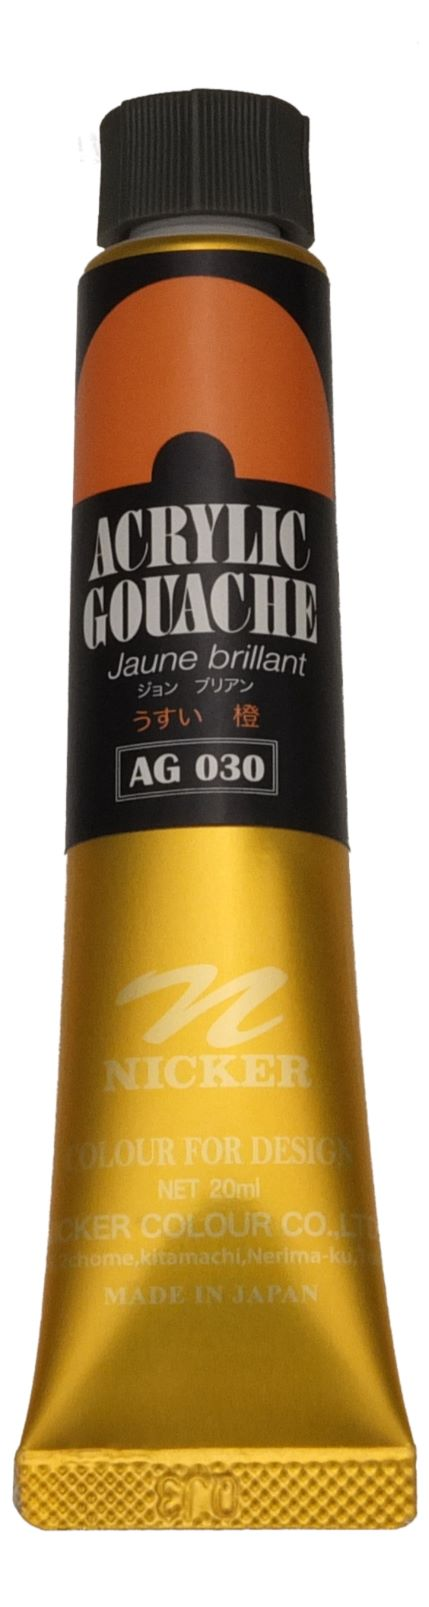 <Discontinued> ACRYLIC GOUACHE 20ml AG030 JAUNE BRILLANT